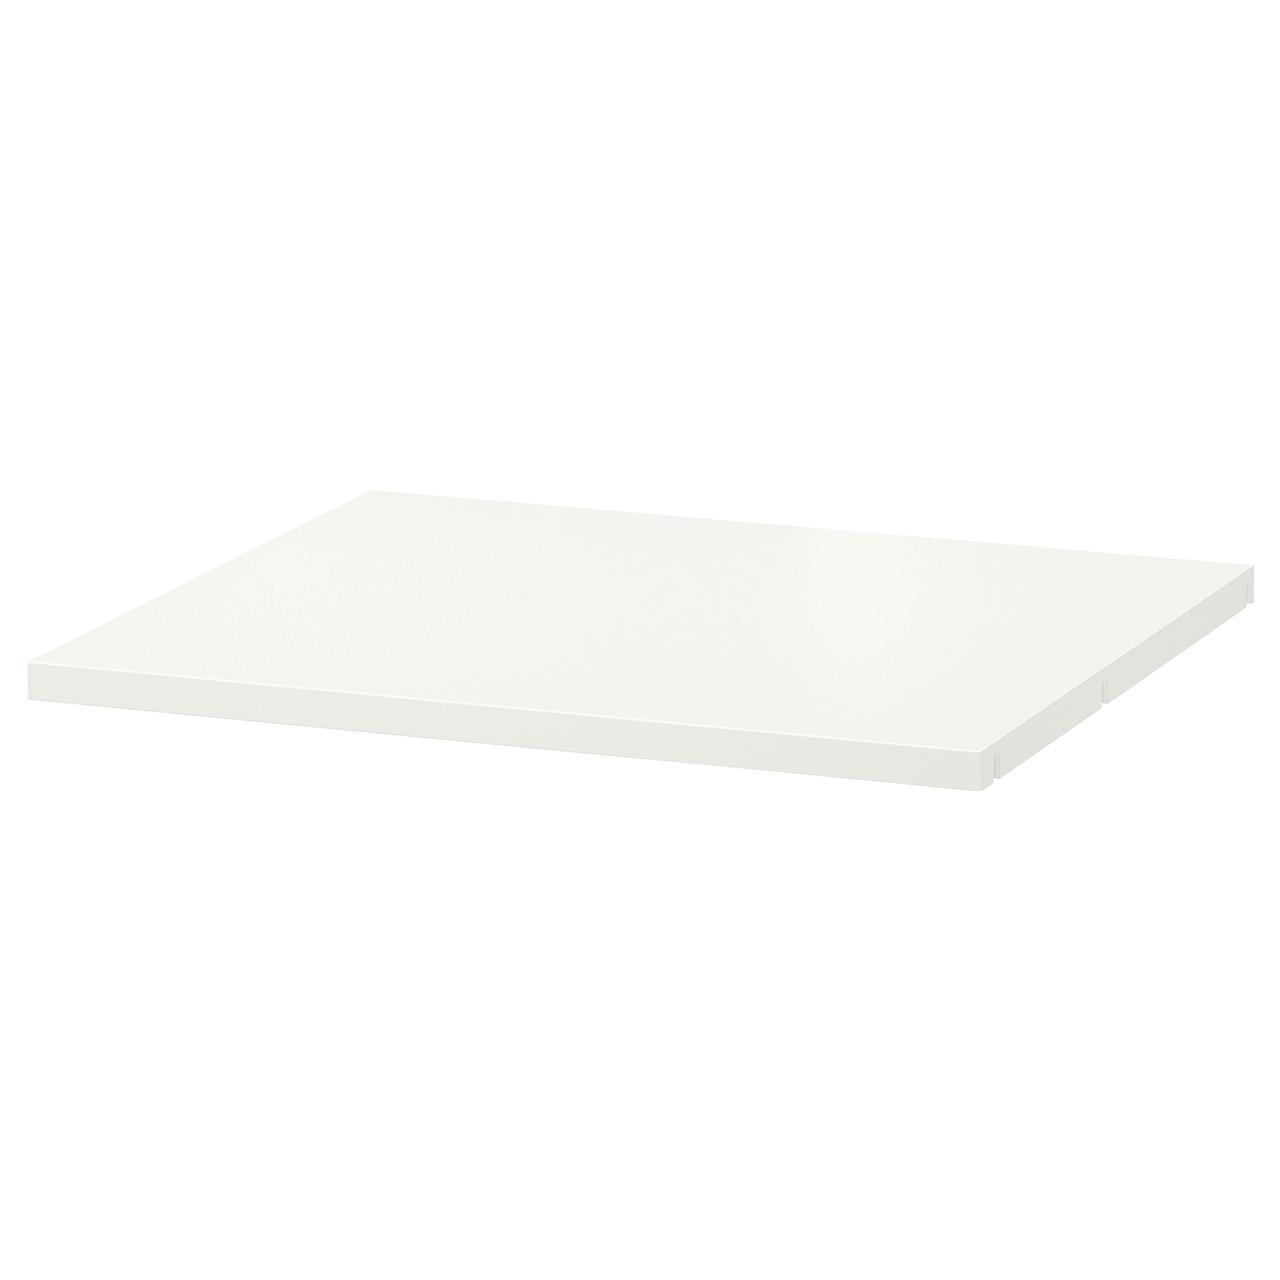 Полка IKEA HJÄLPA белый 60x55 см 903.311.66